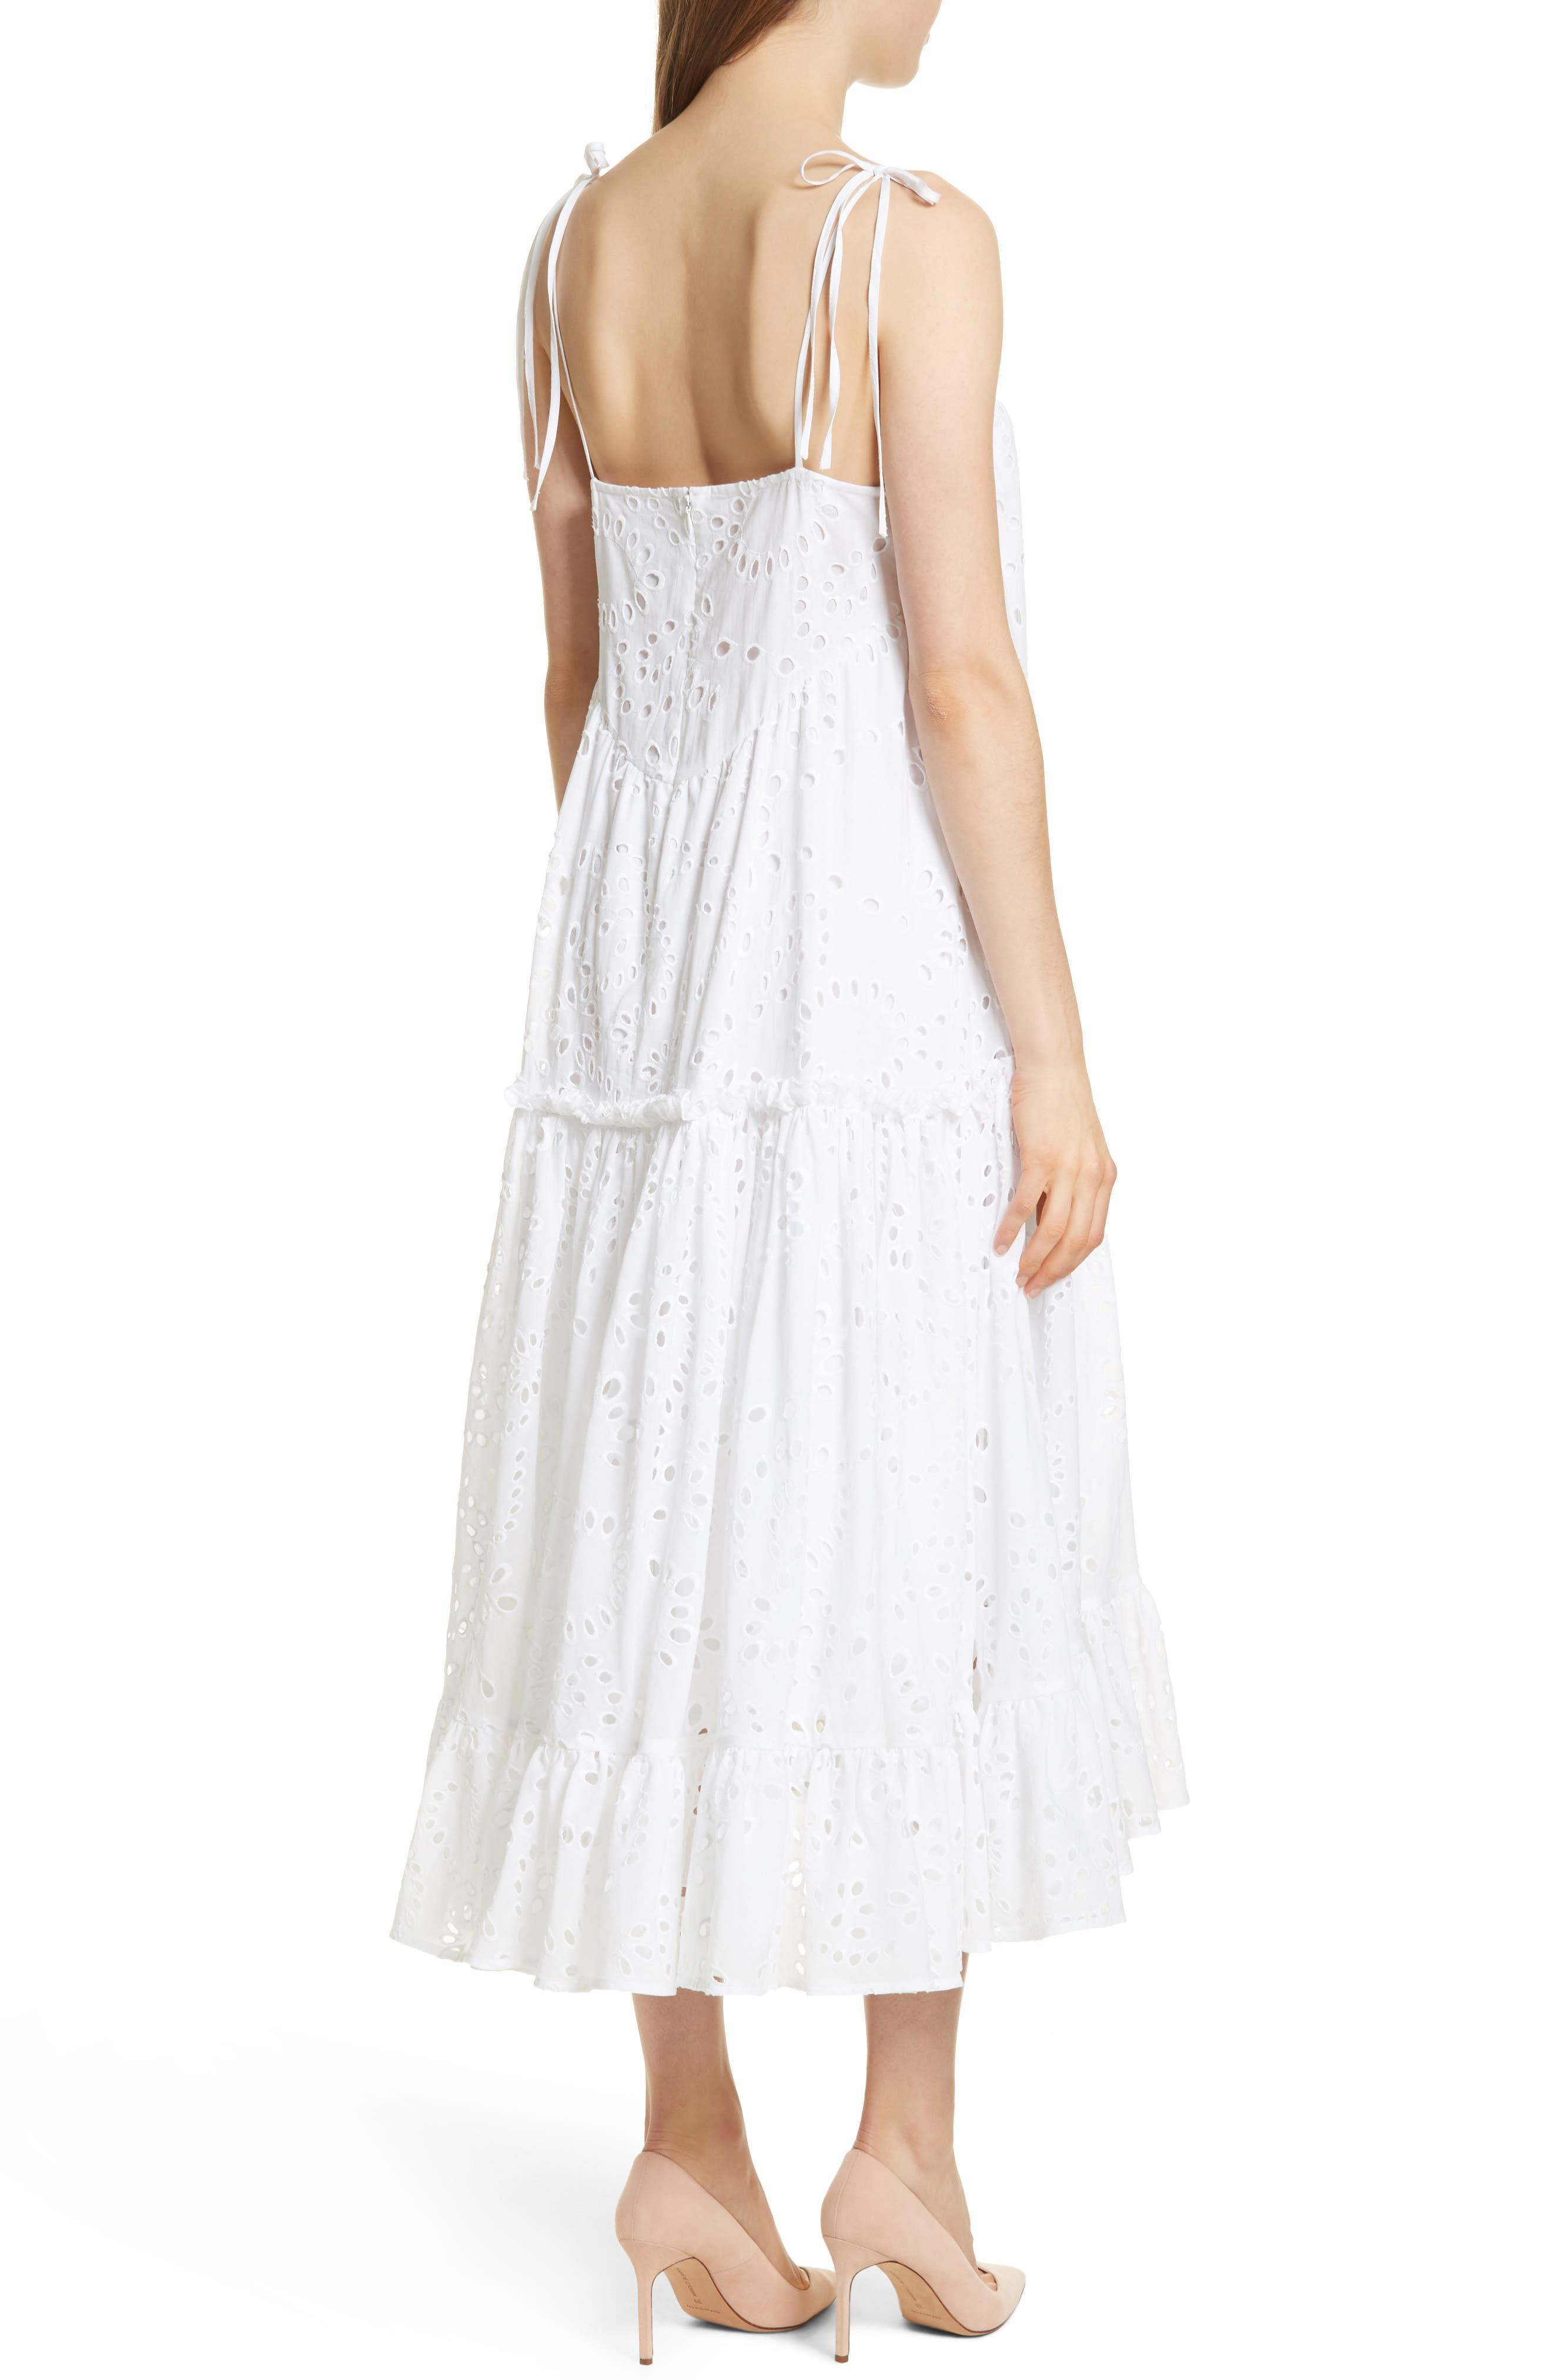 Prose & Poetry Kerr Eyelet Peasant Midi Dress,                             Alternate thumbnail 2, color,                             Cloud White